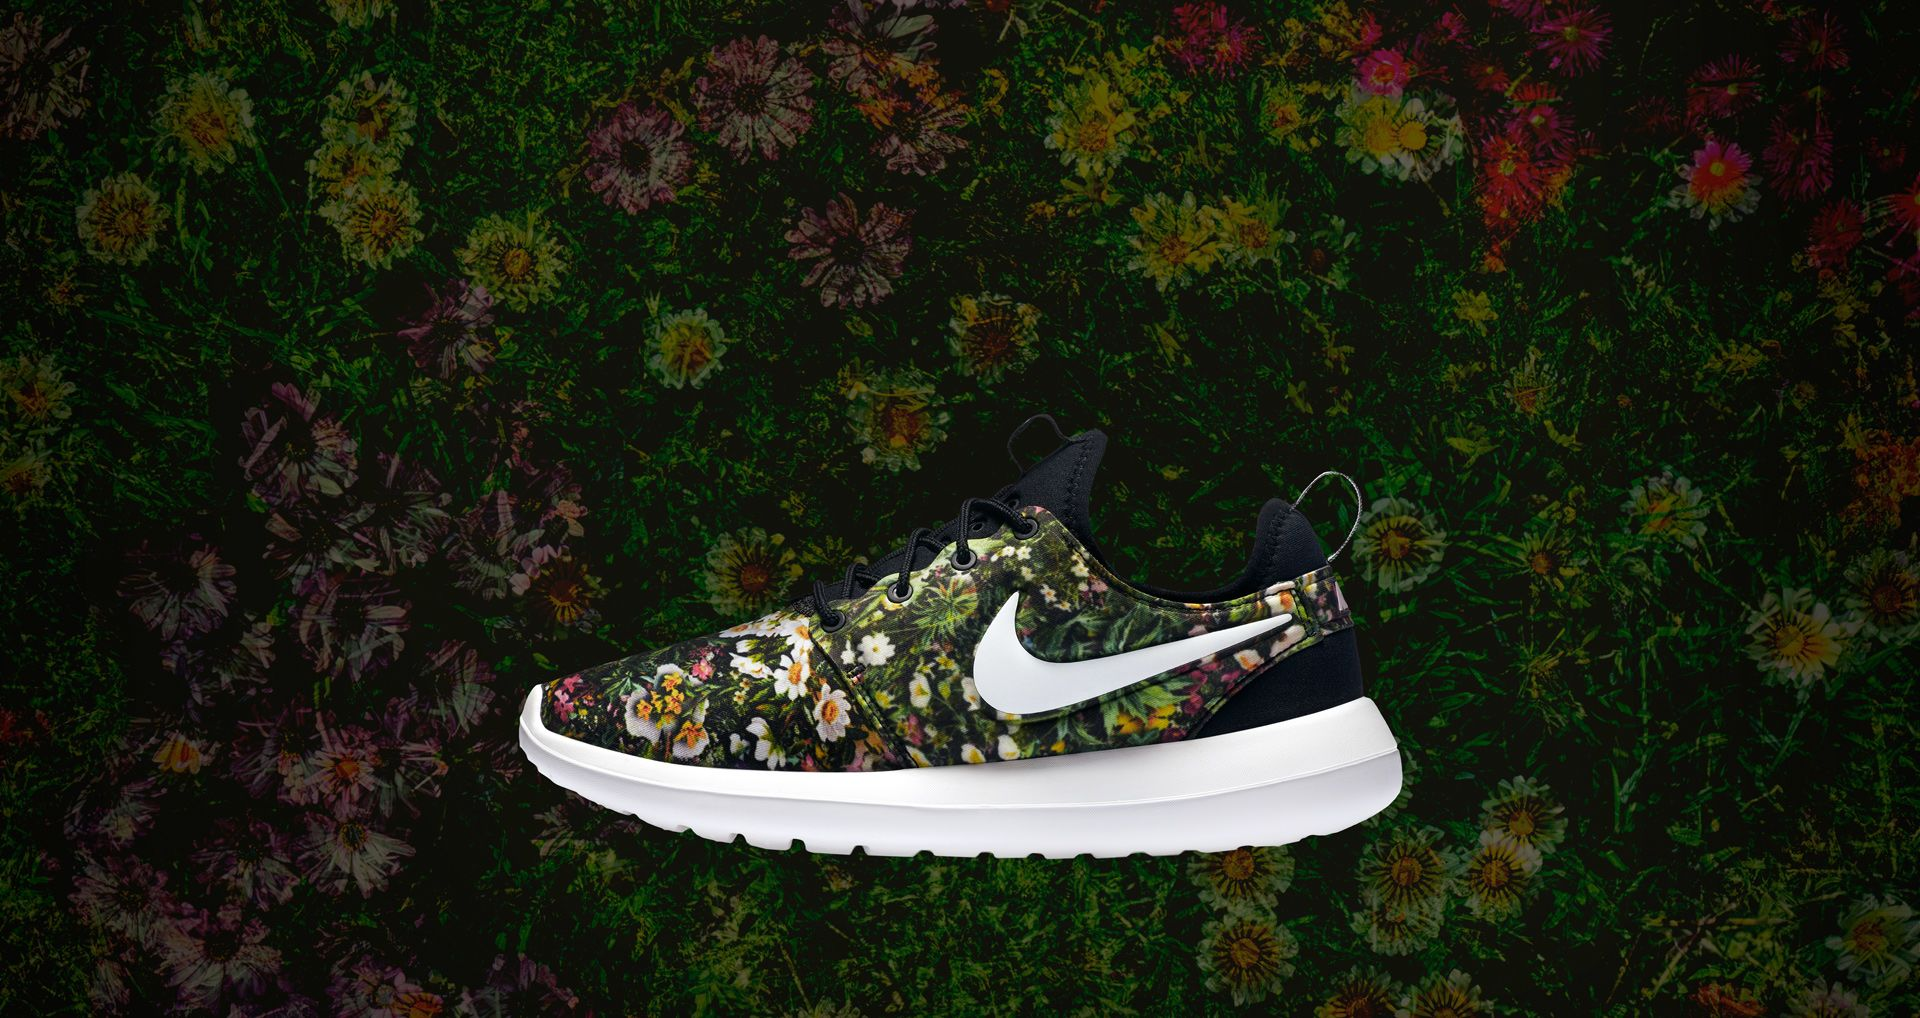 sports shoes fb156 5ce77 Women's Nike Roshe Two Print 'Spring Garden'. Nike+ SNKRS